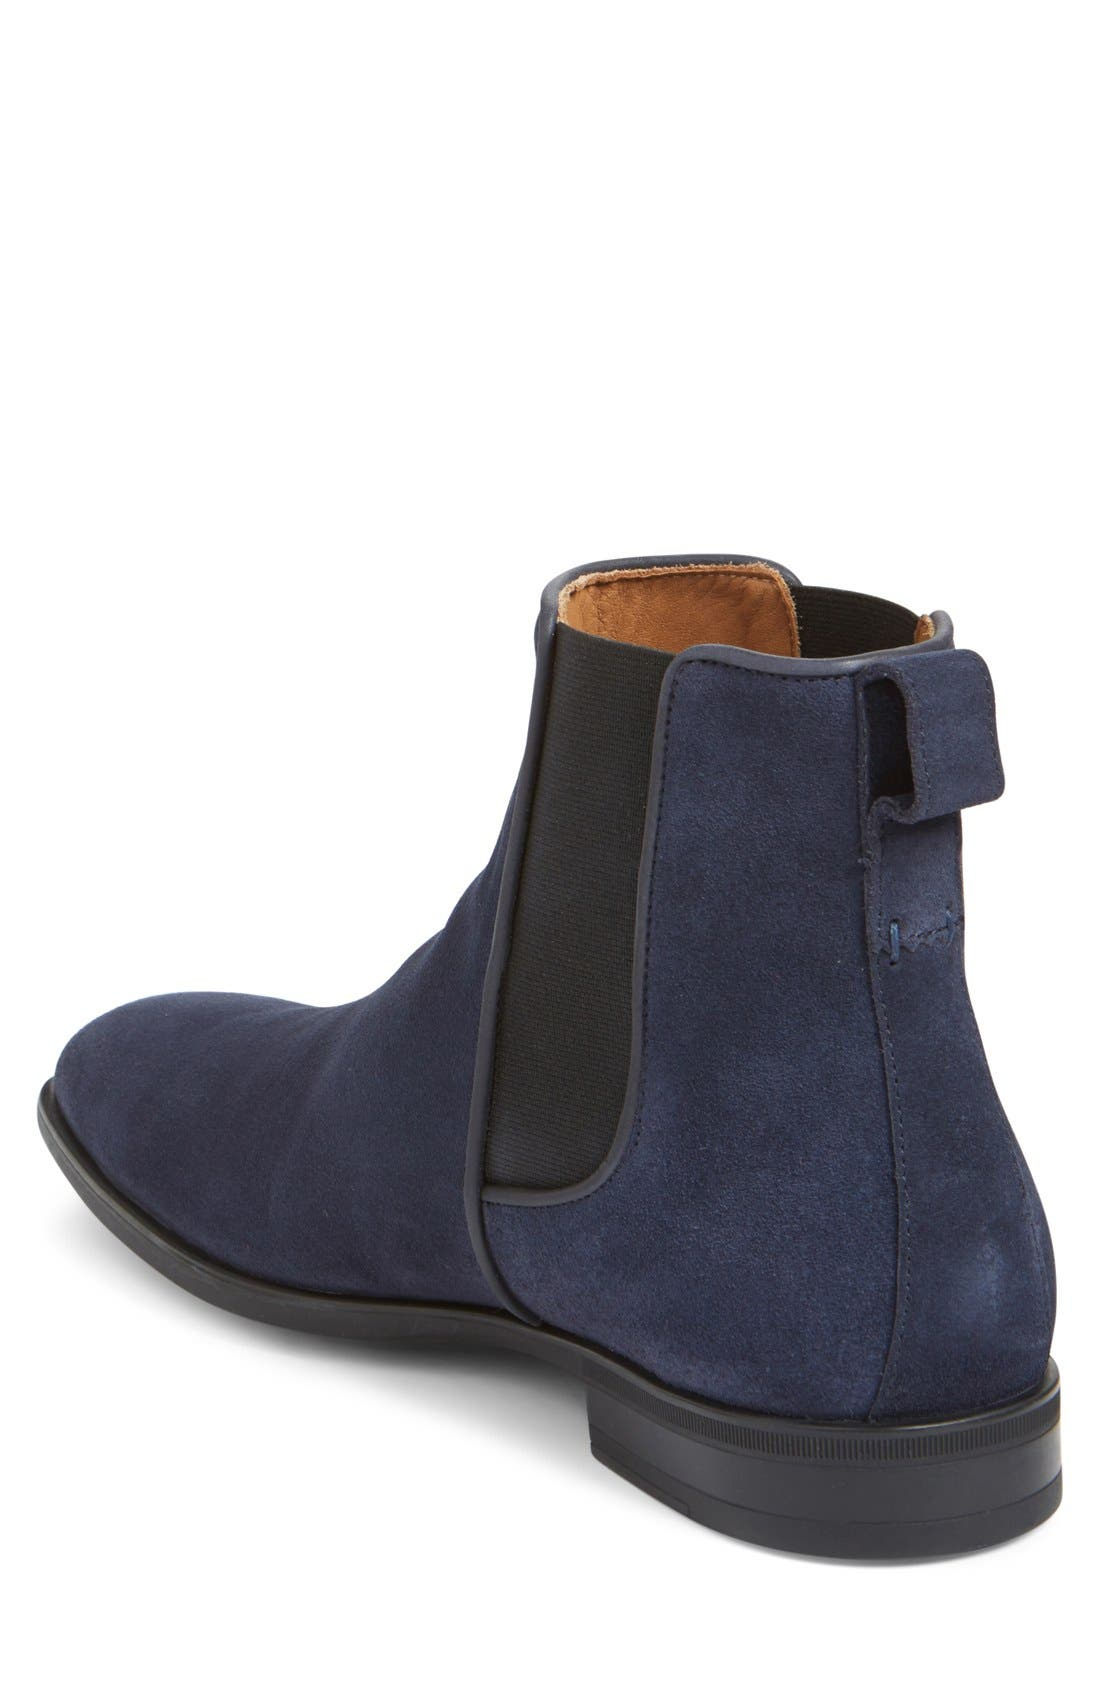 Alternate Image 2  - Aquatalia'Adrian' Weatherproof Chelsea Boot (Men)